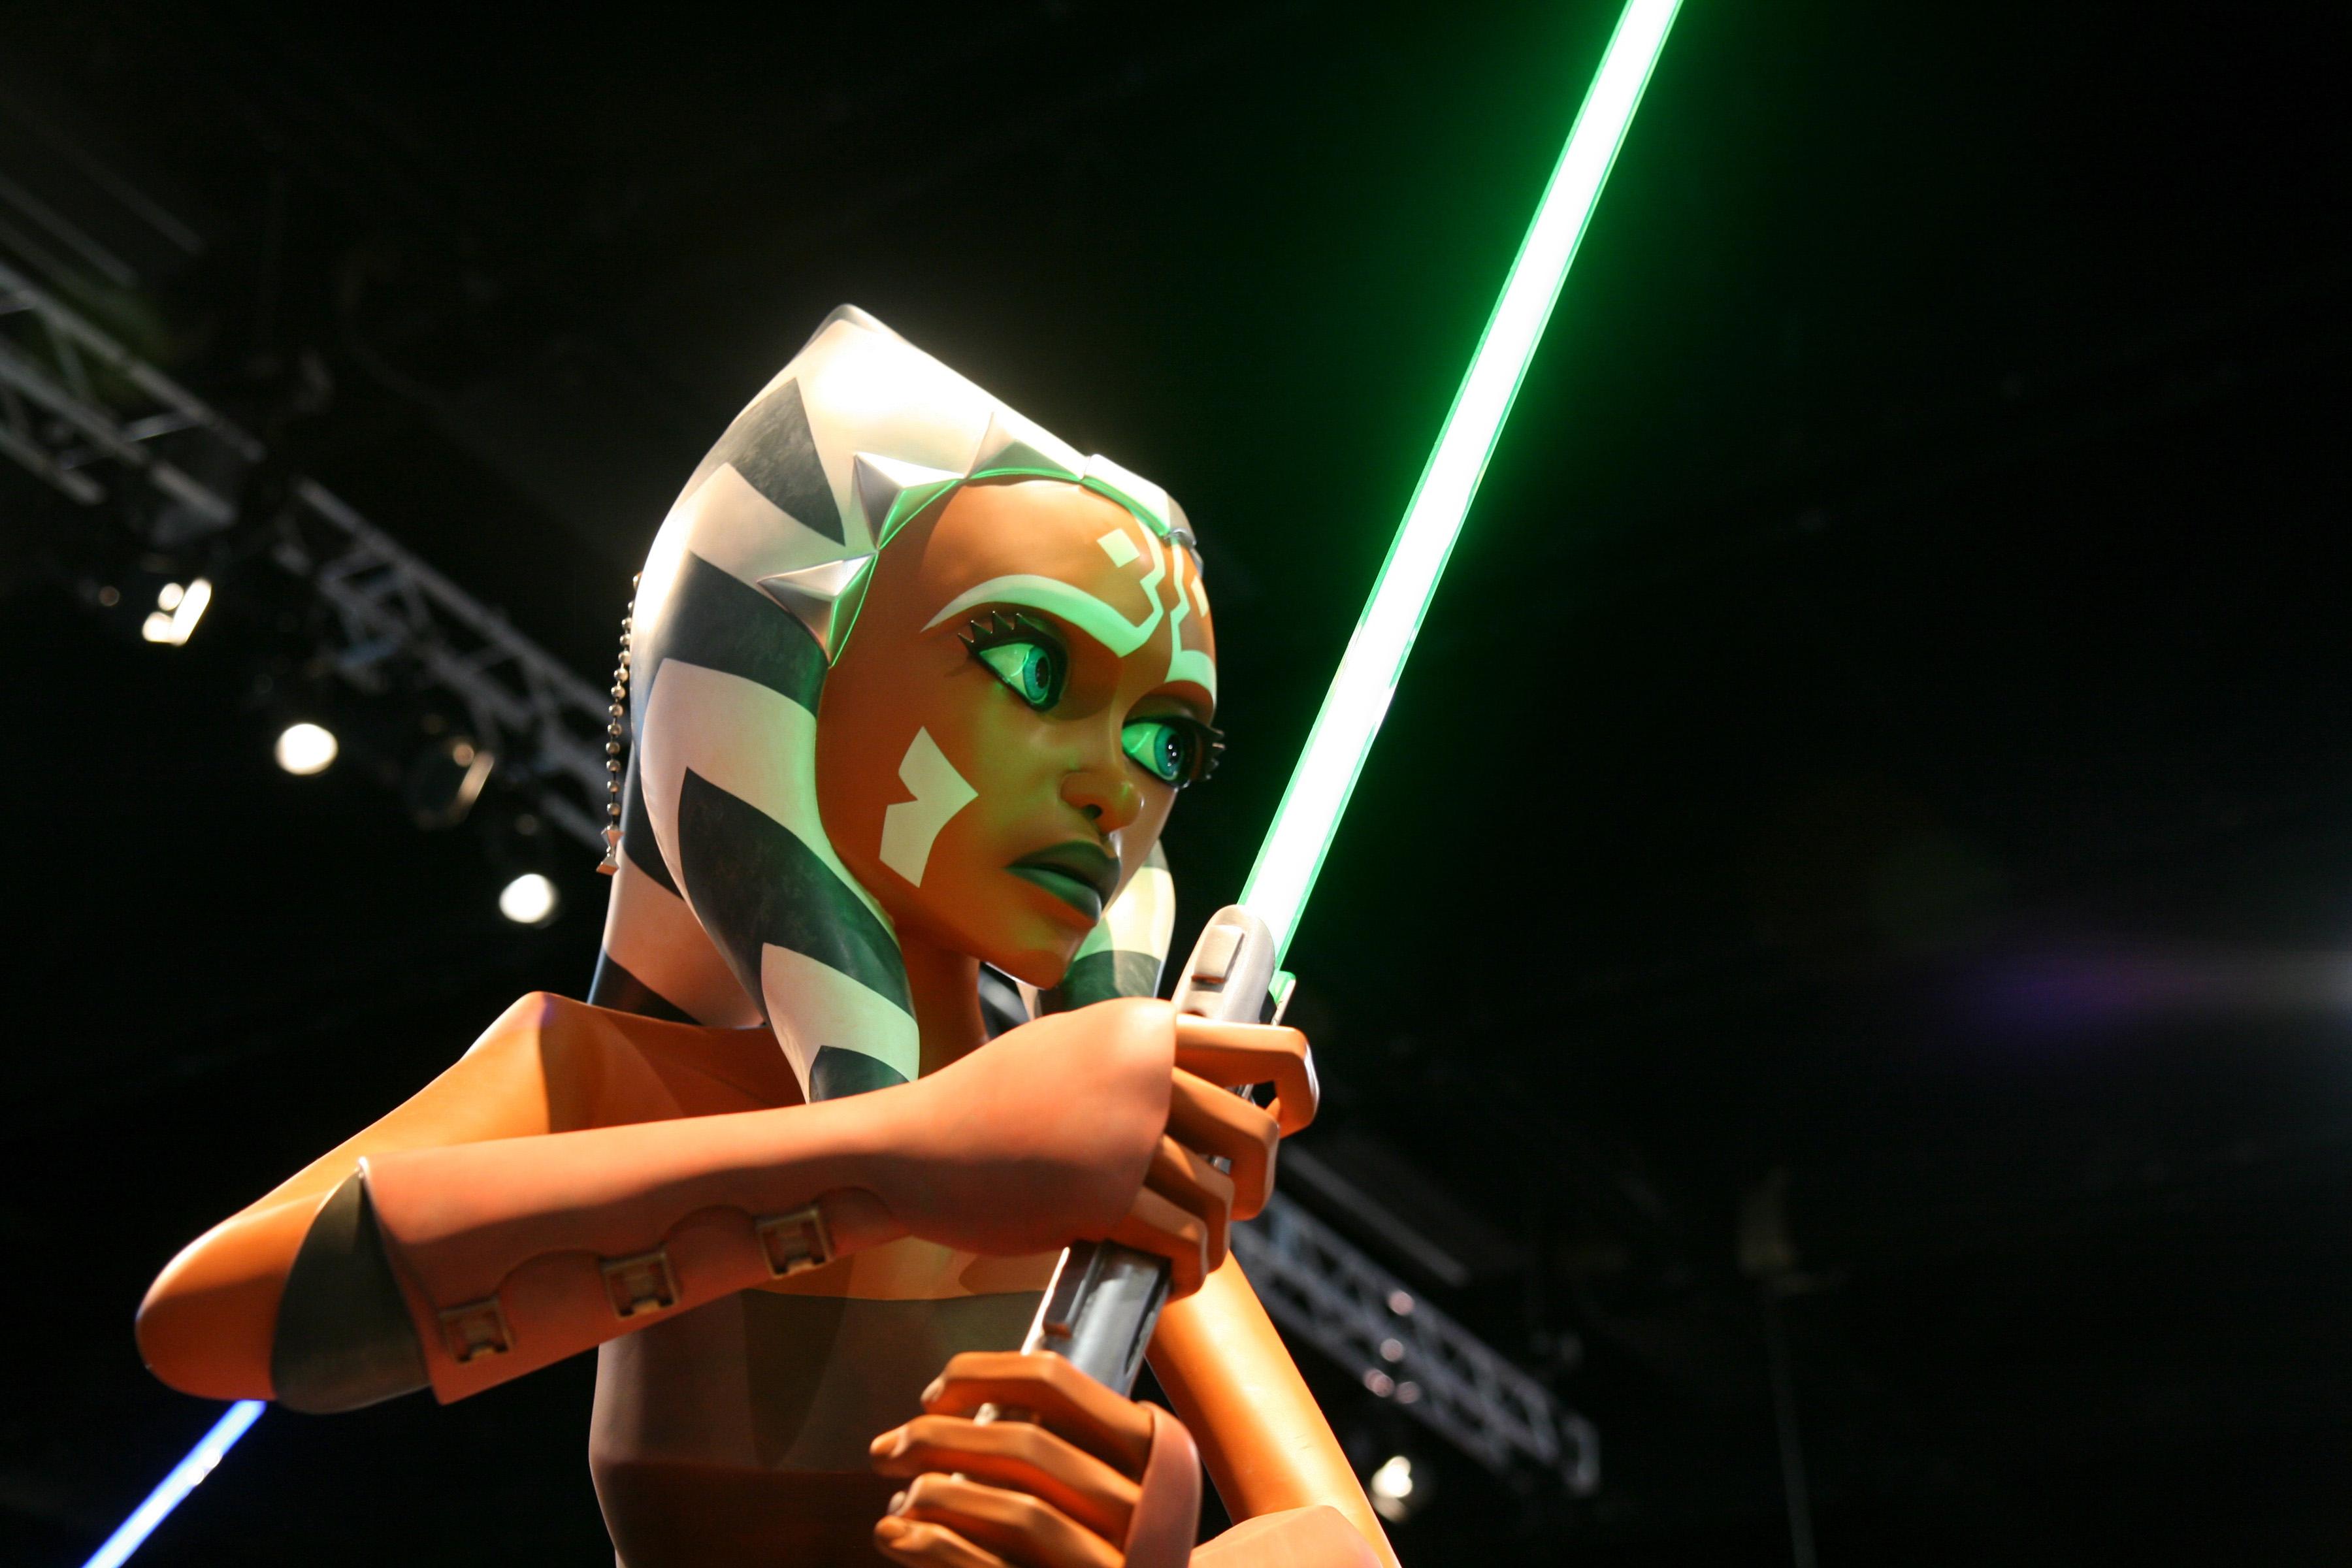 Star wars the clone wars ahsoka tano  naked photo